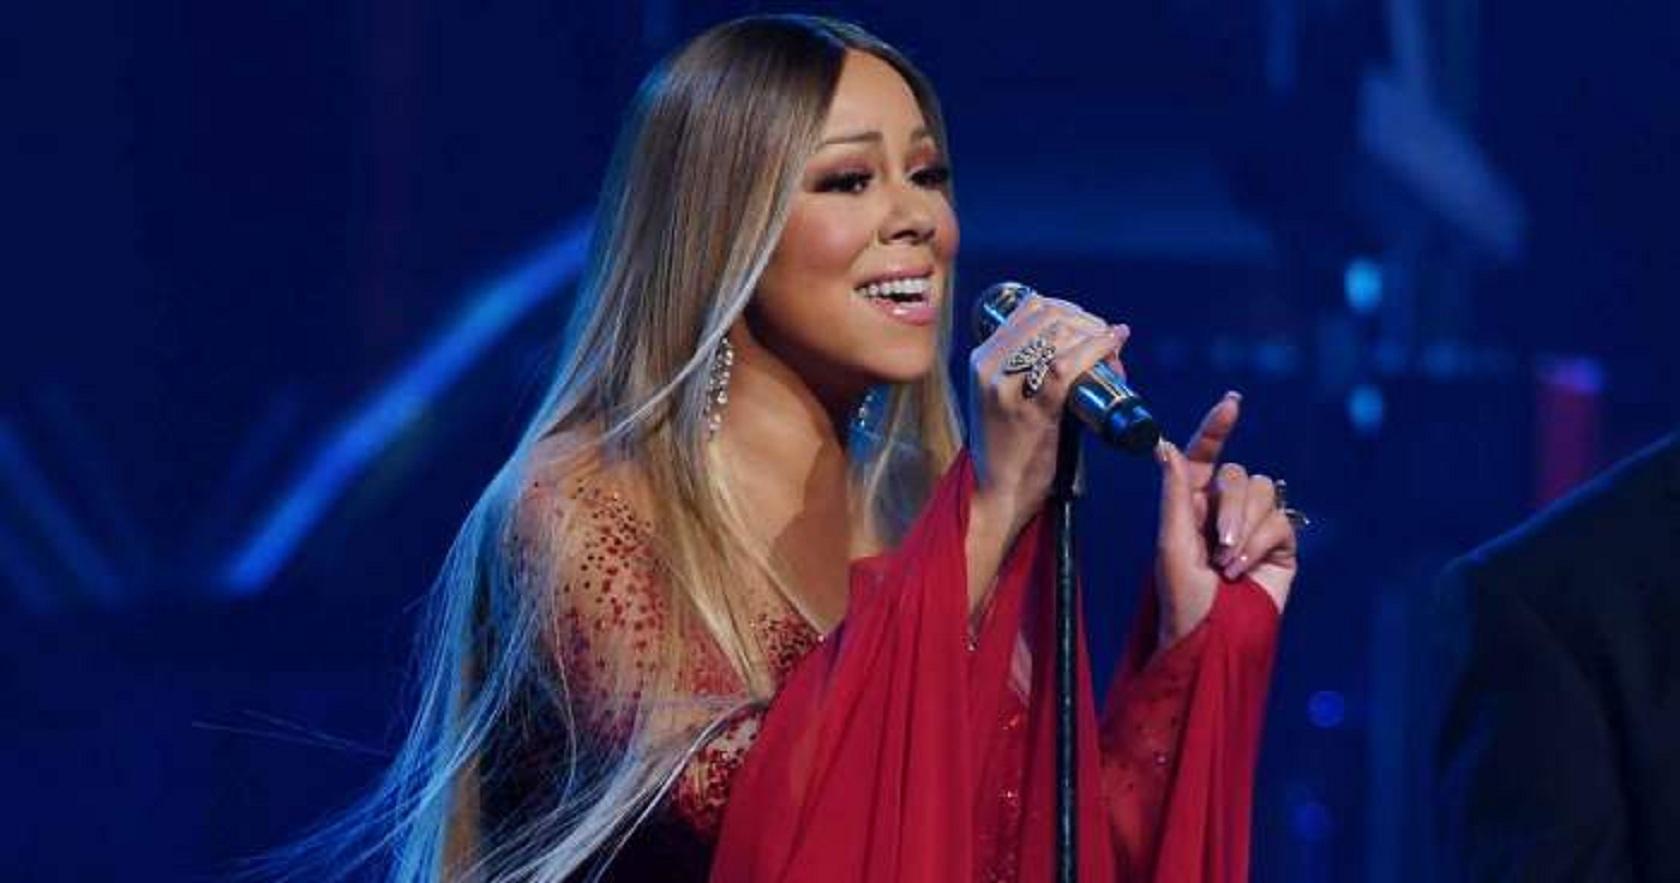 Mariah Carey's 5 Best Performances from 2018 – So far!